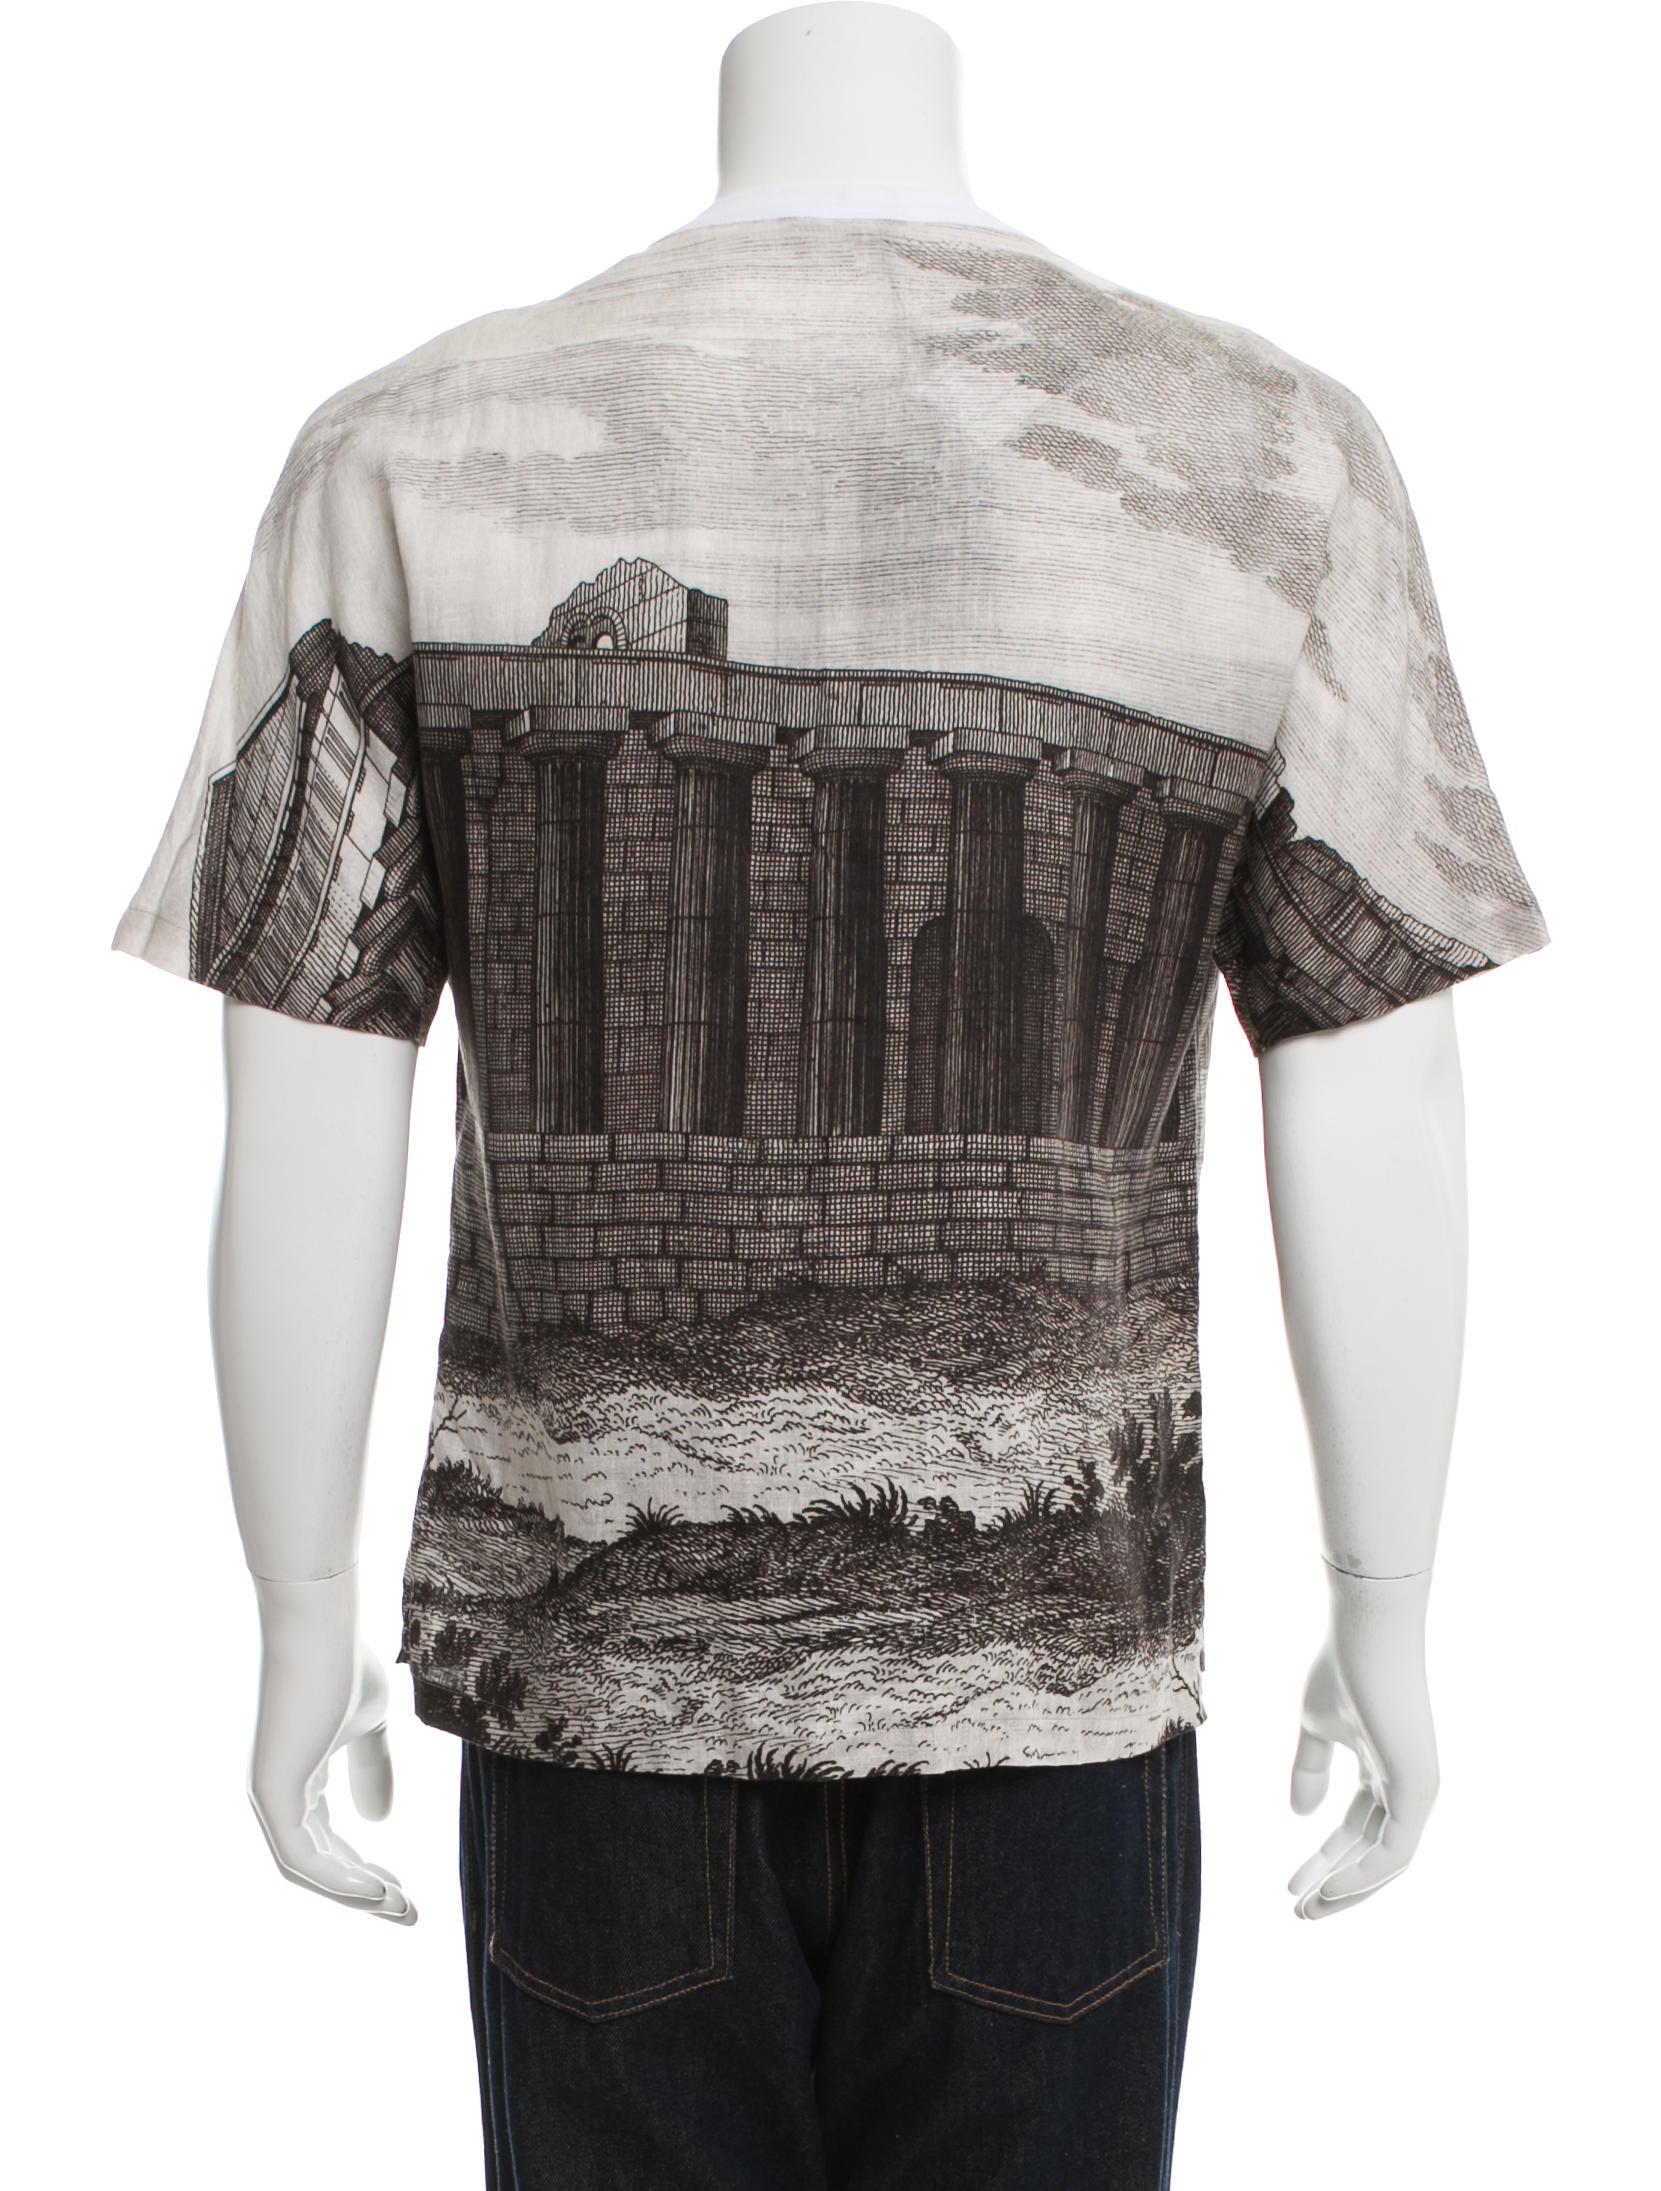 Dolce gabbana printed henley t shirt w tags clothing for Dolce and gabbana printed t shirts